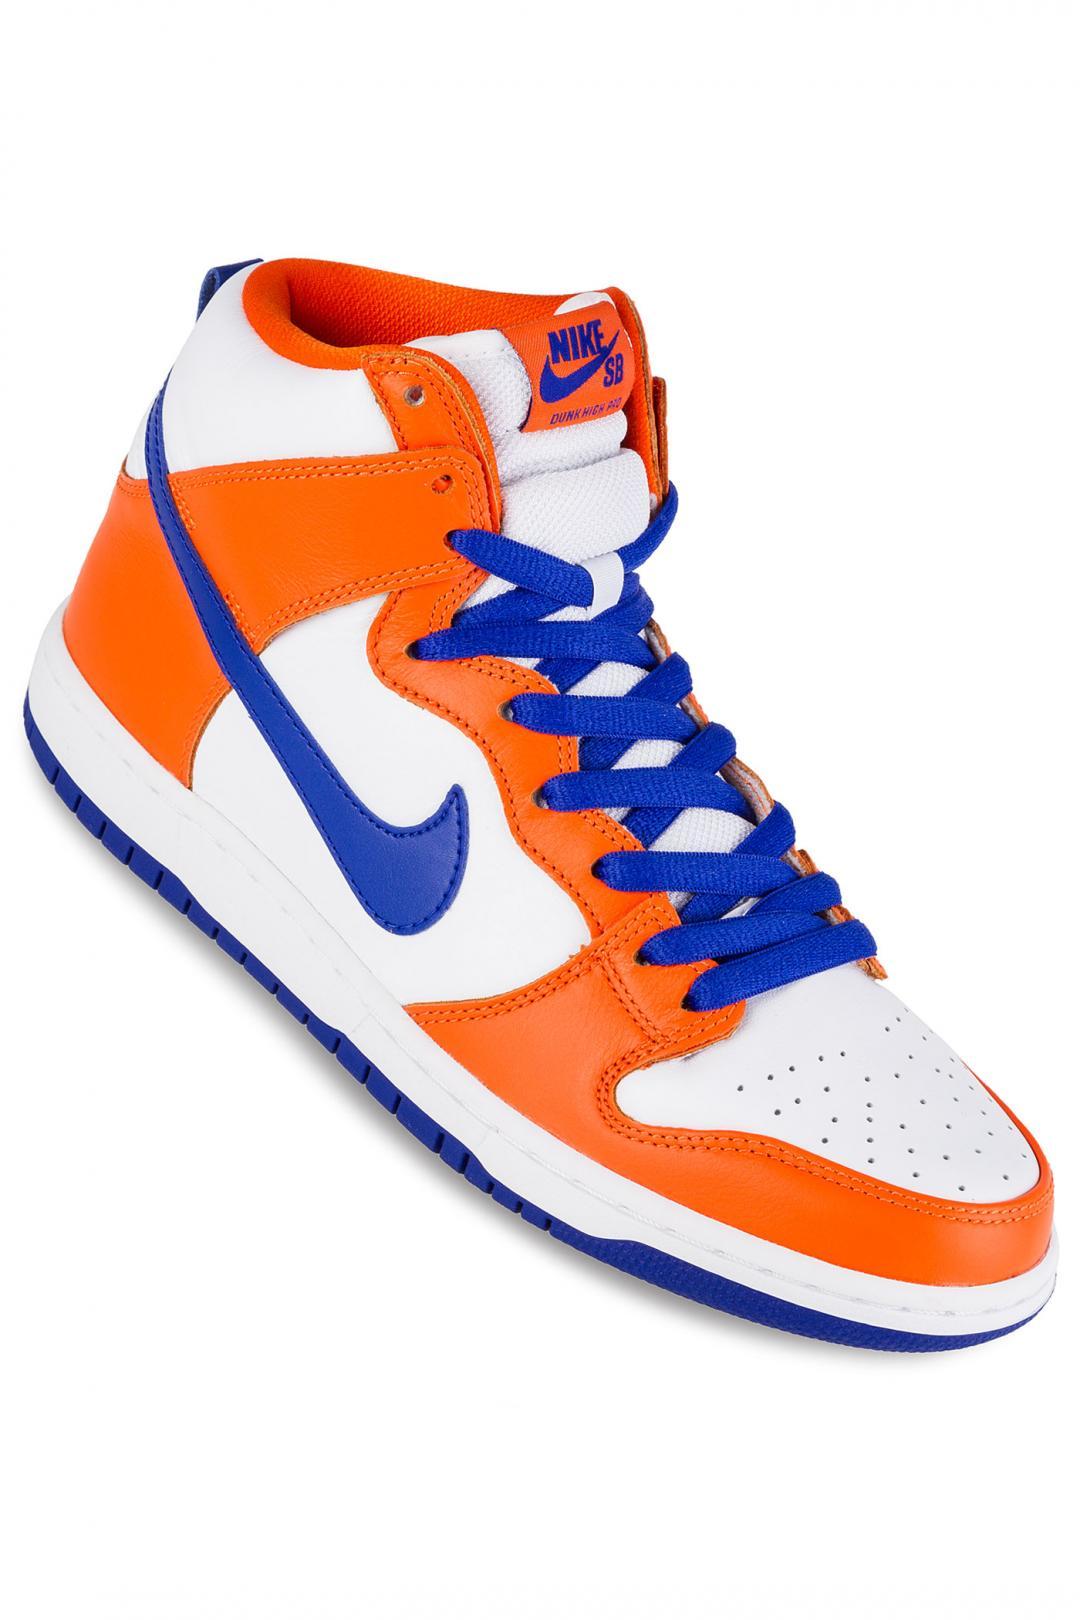 Uomo Nike SB Dunk High OG Danny Supa QS safety orange hyper blue white | Scarpe da skate